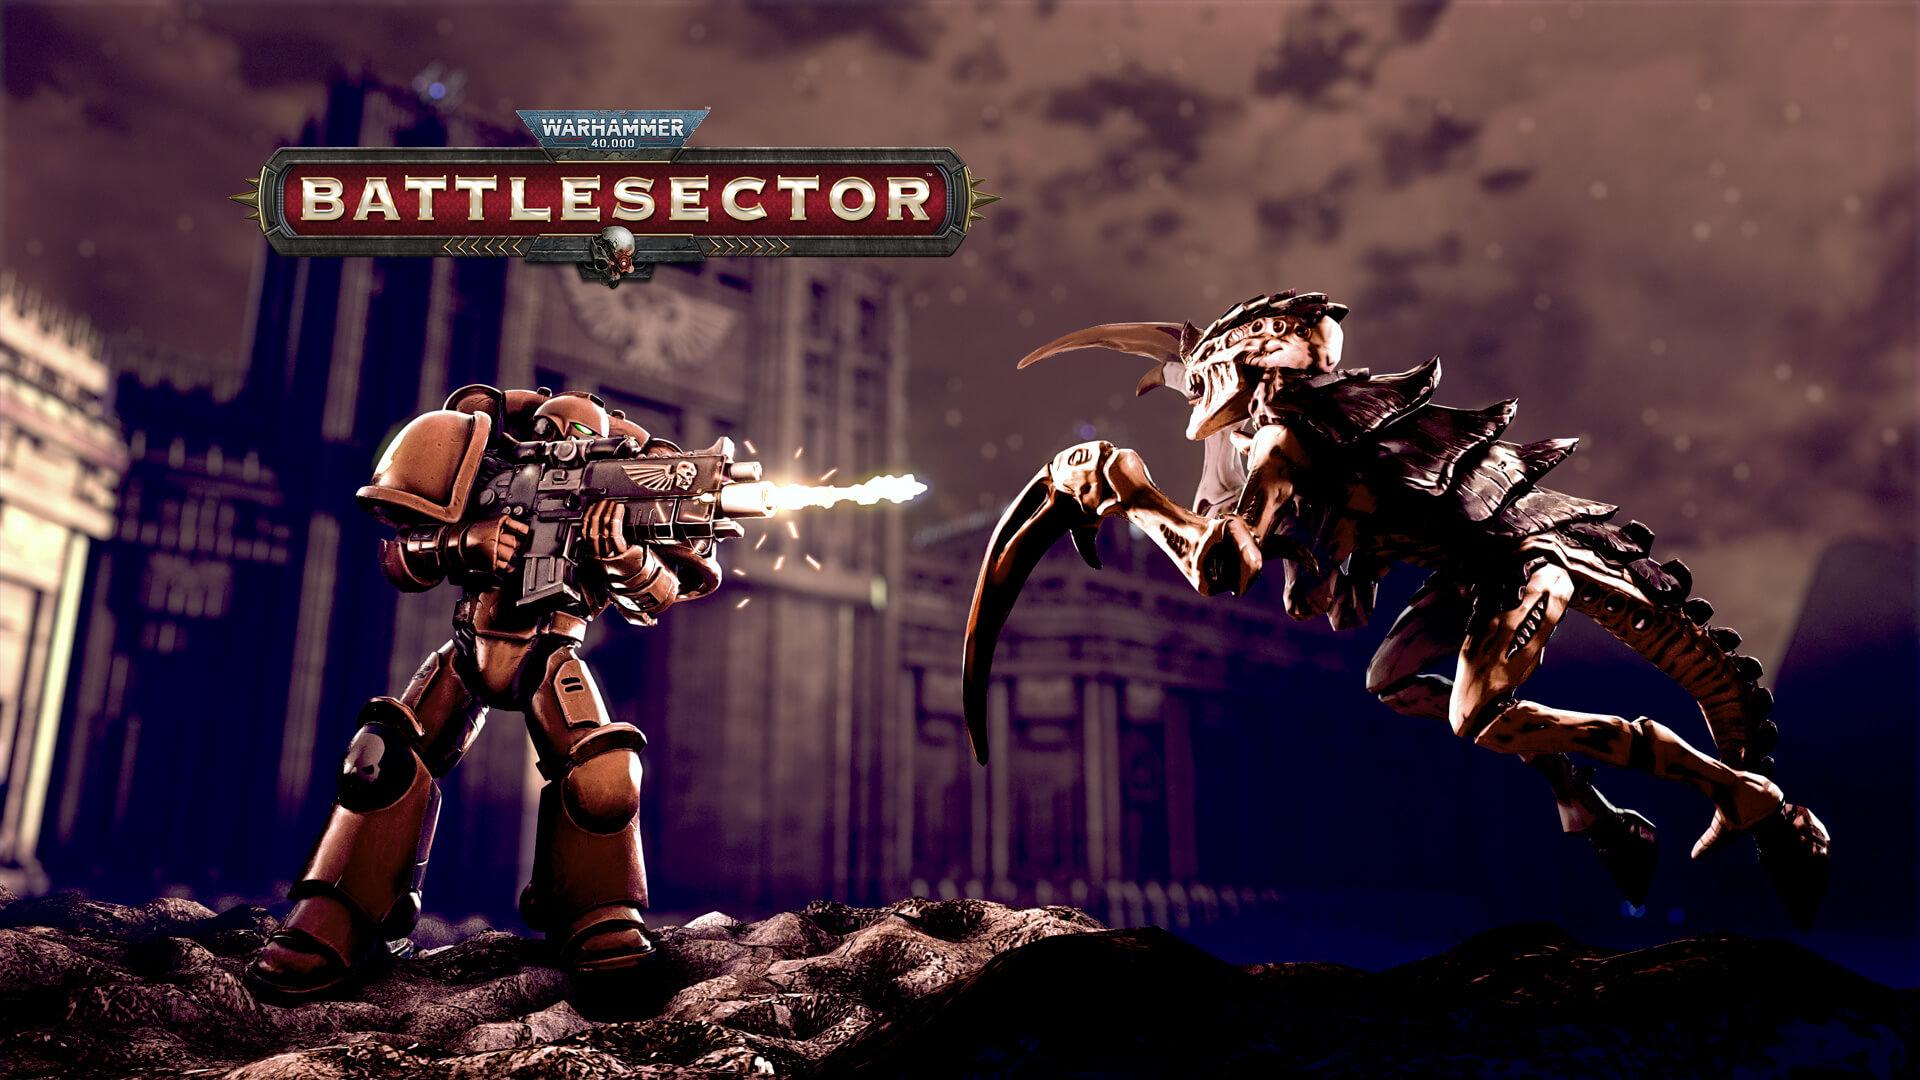 warhammer battle sector